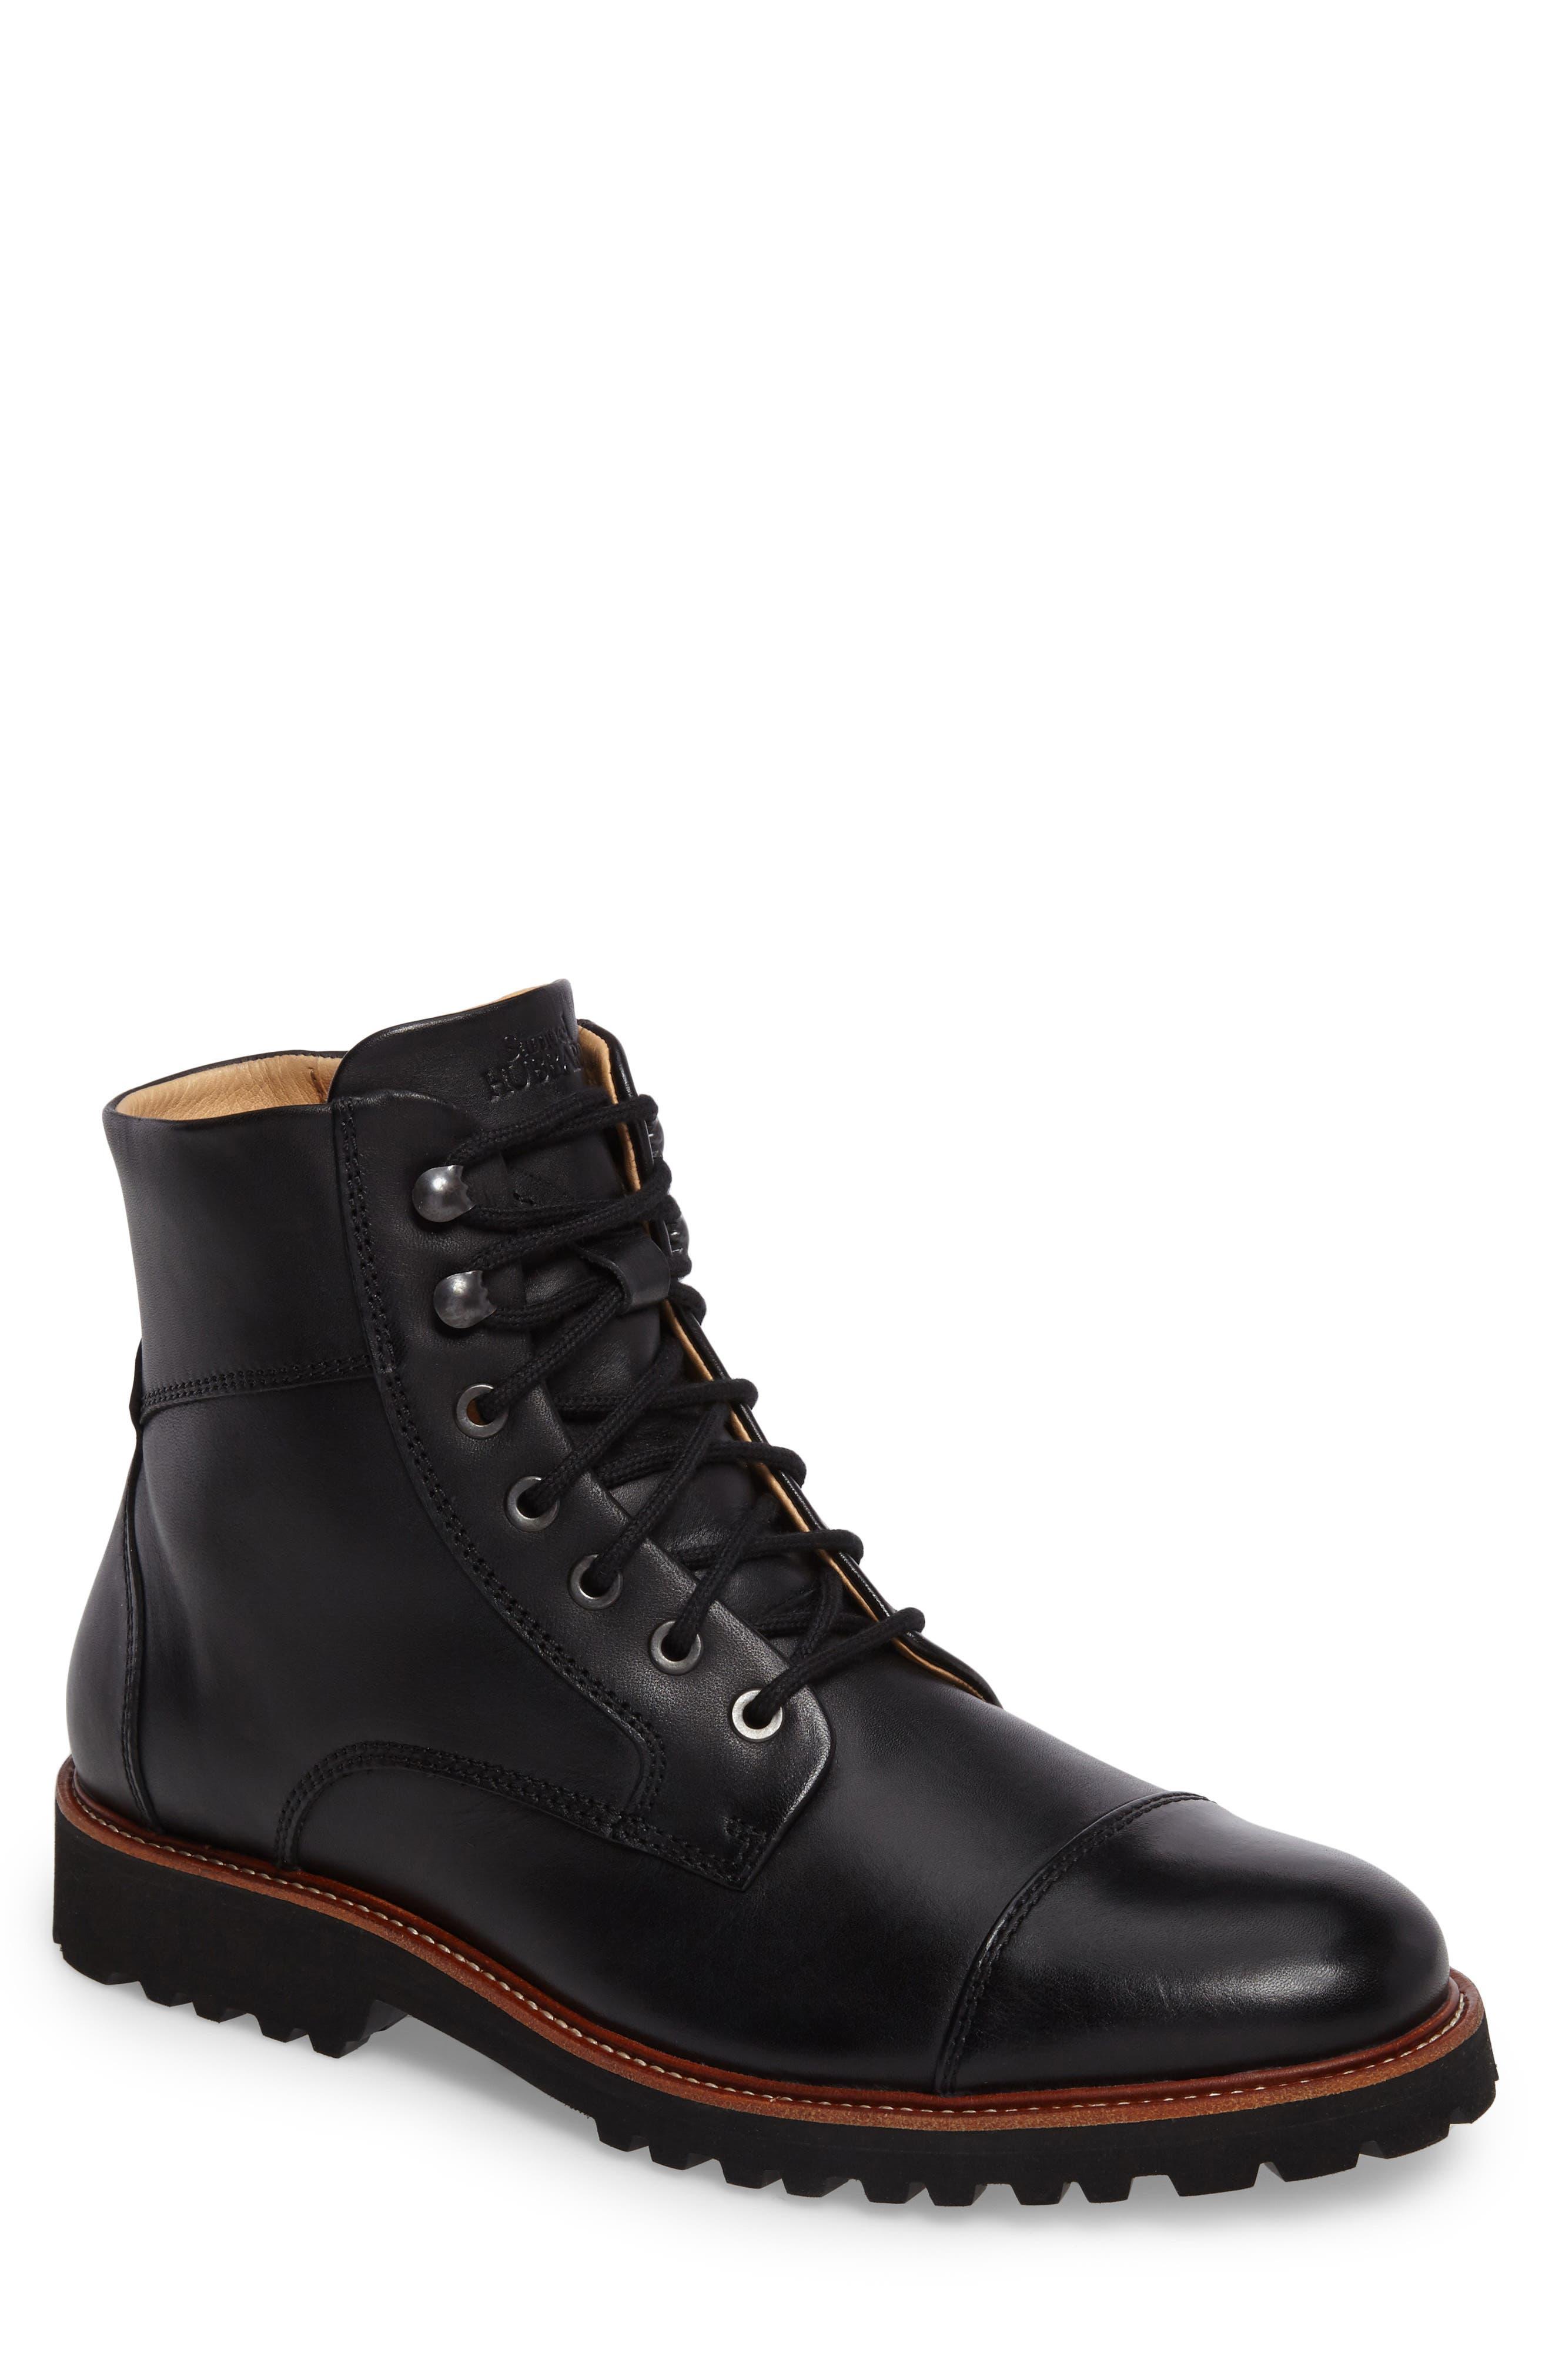 Samuel Hubbard Uptown Maverick Cap Toe Boot, Black